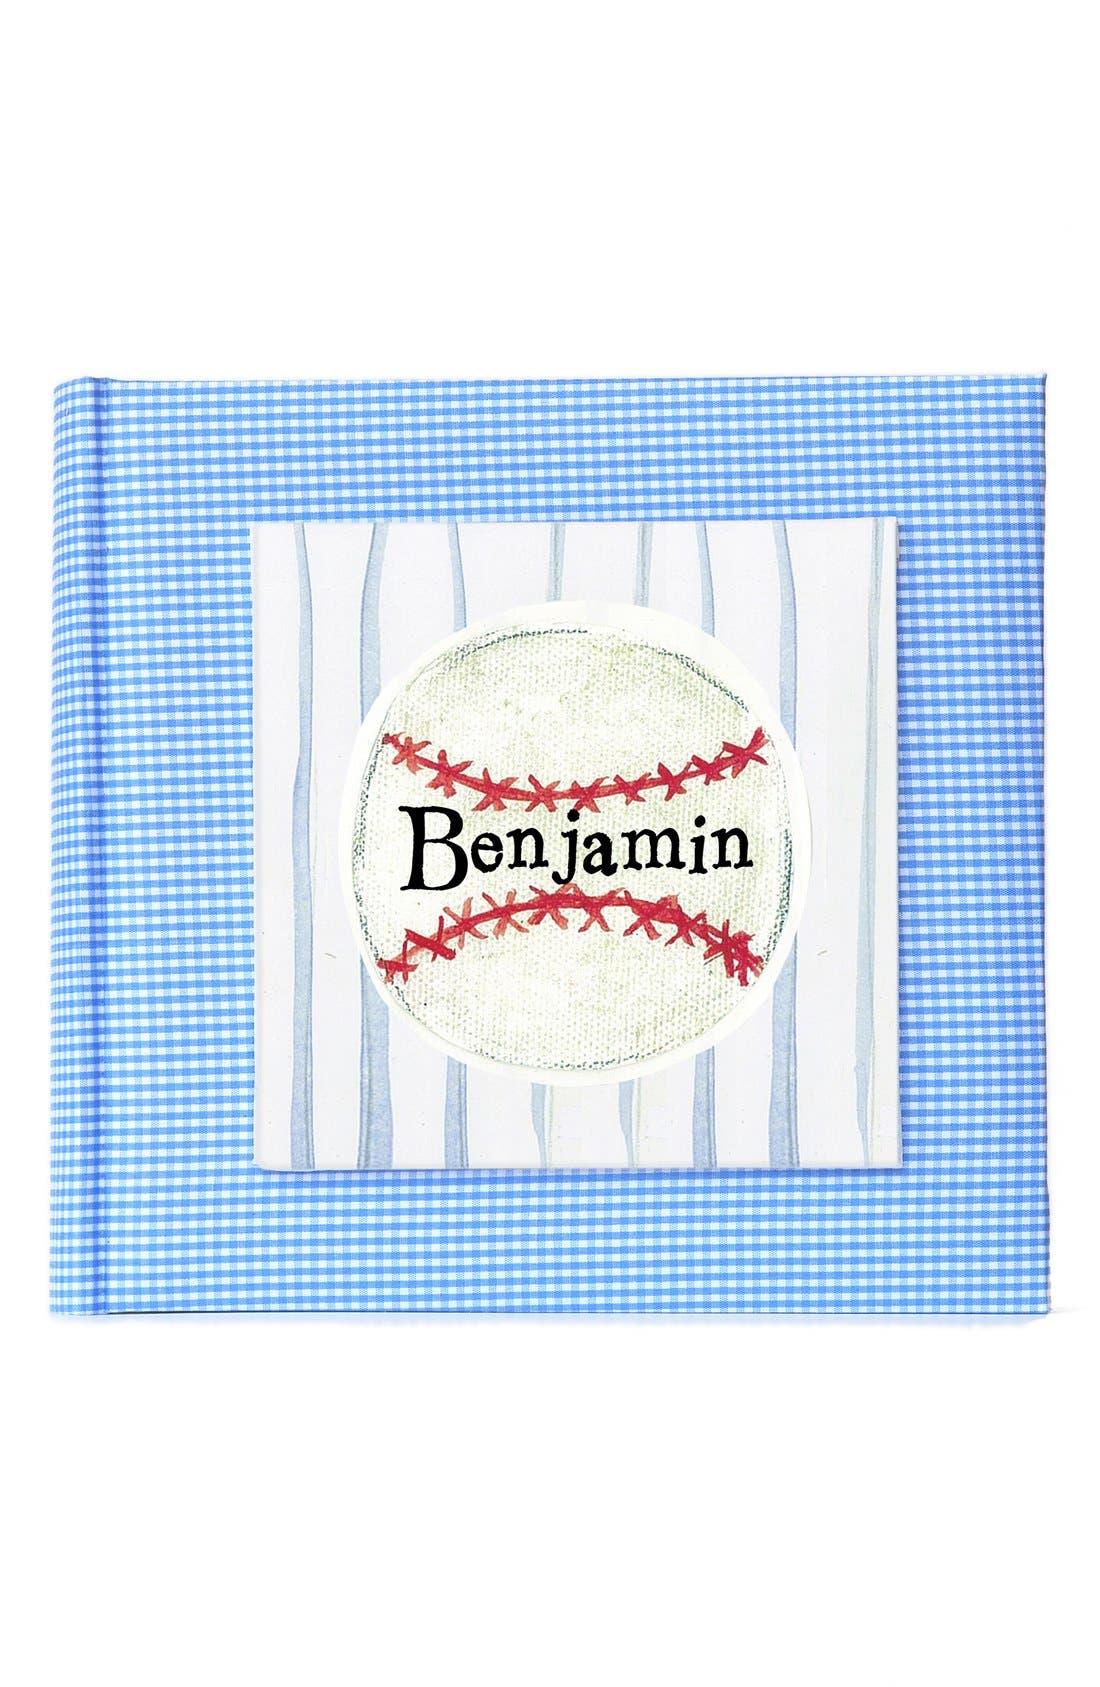 'Baseball' Personalized Photo Album,                         Main,                         color, 400